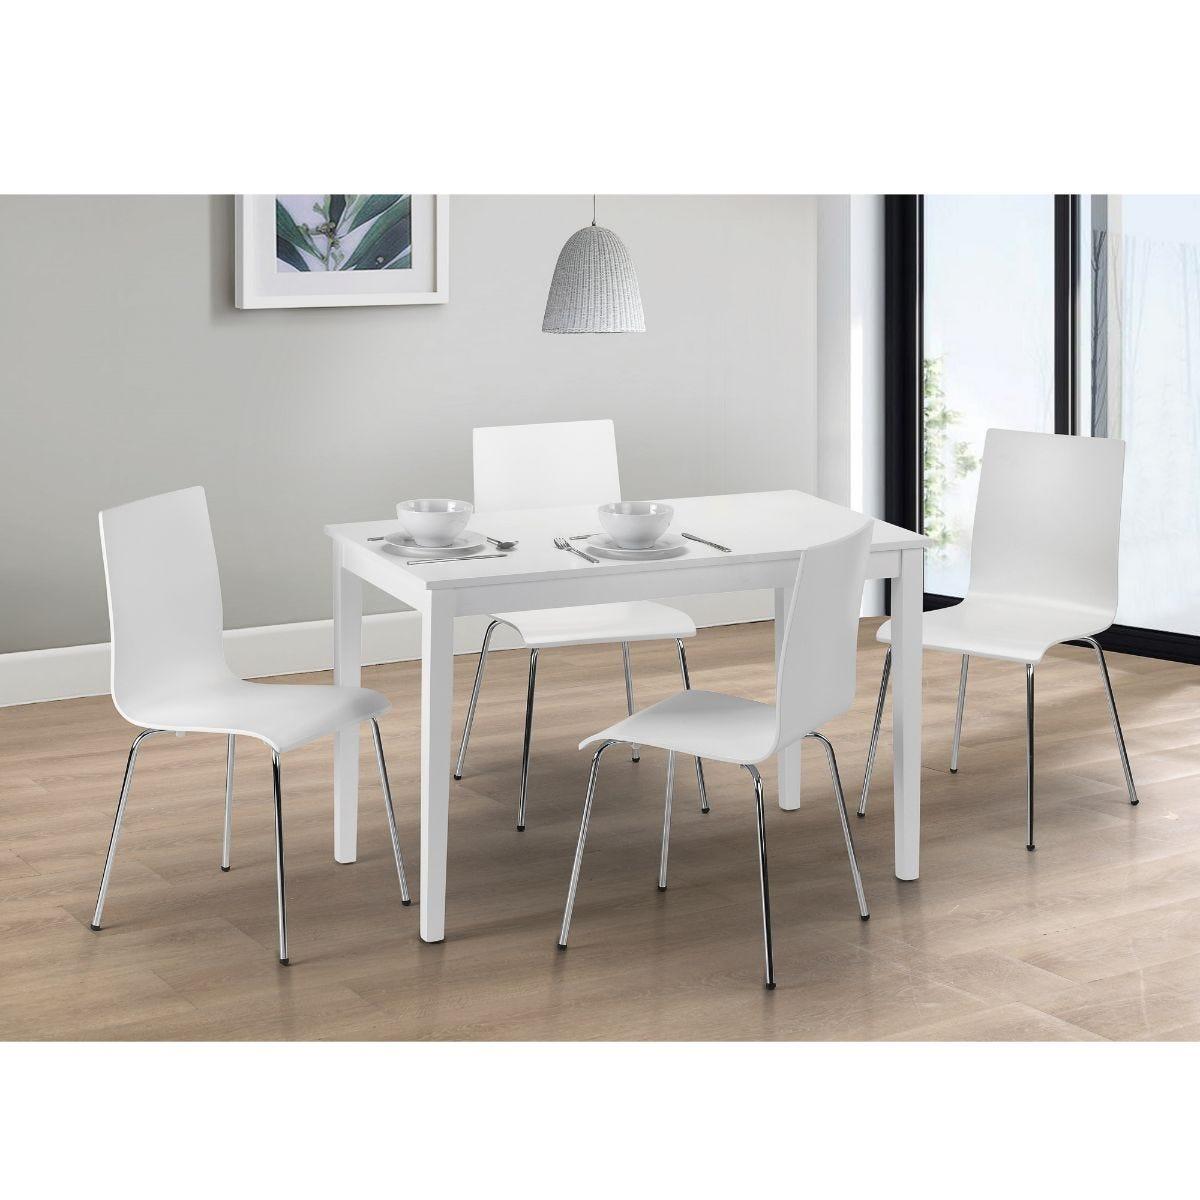 Julian Bowen Taku Dining Table Grey